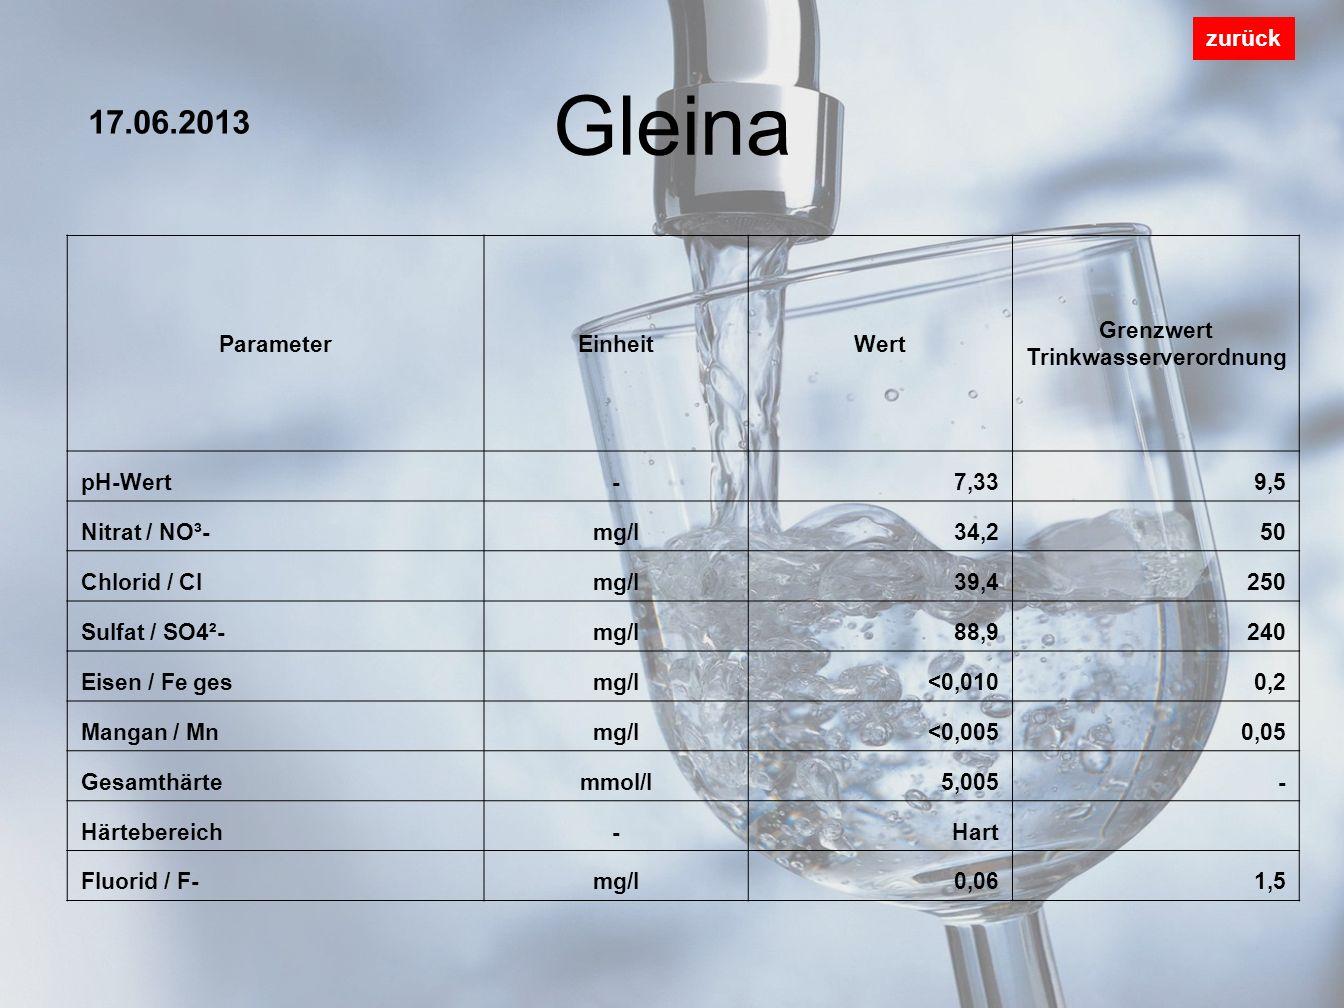 Gleina zurück ParameterEinheitWert Grenzwert Trinkwasserverordnung pH-Wert-7,339,5 Nitrat / NO³-mg/l34,250 Chlorid / Clmg/l39,4250 Sulfat / SO4²-mg/l8